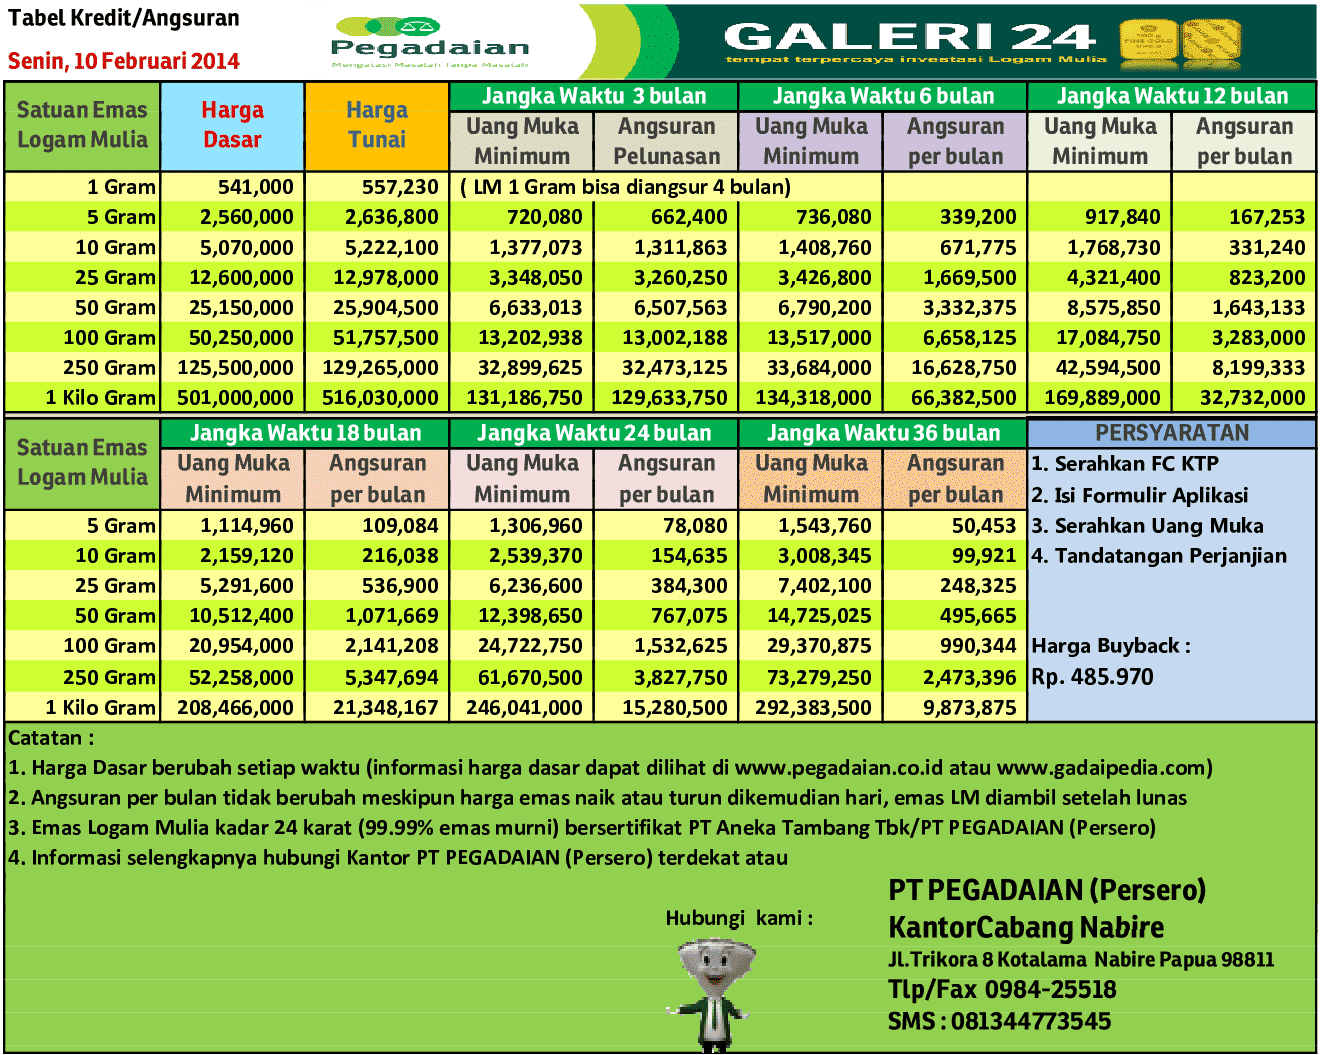 harga emas dan tabel emas pegadaian 10 februari 2014